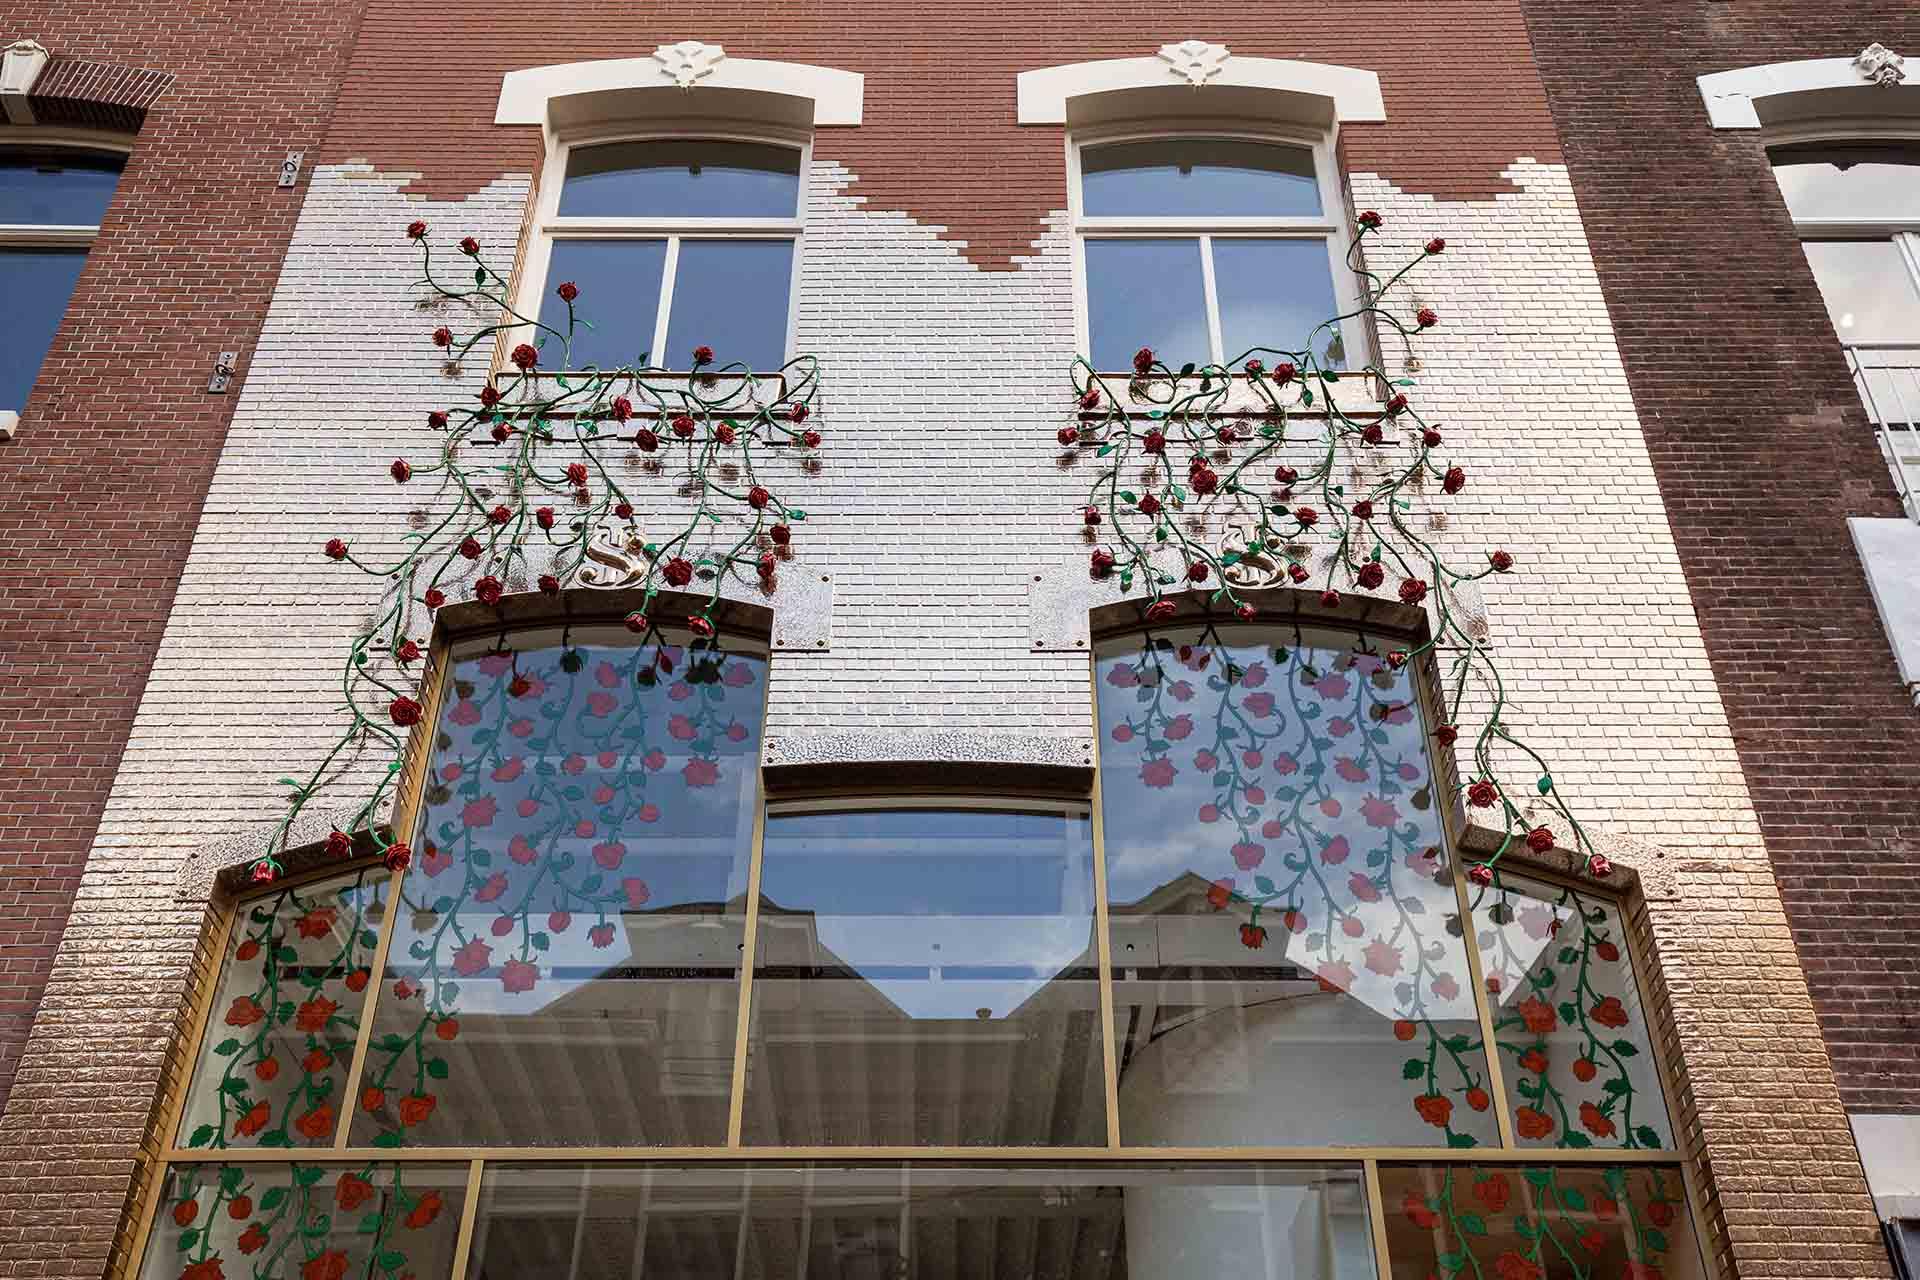 MHB-SL30-ISO-2020-PV-P.C.-Hooftstraat-45-Amsterdam-1-10